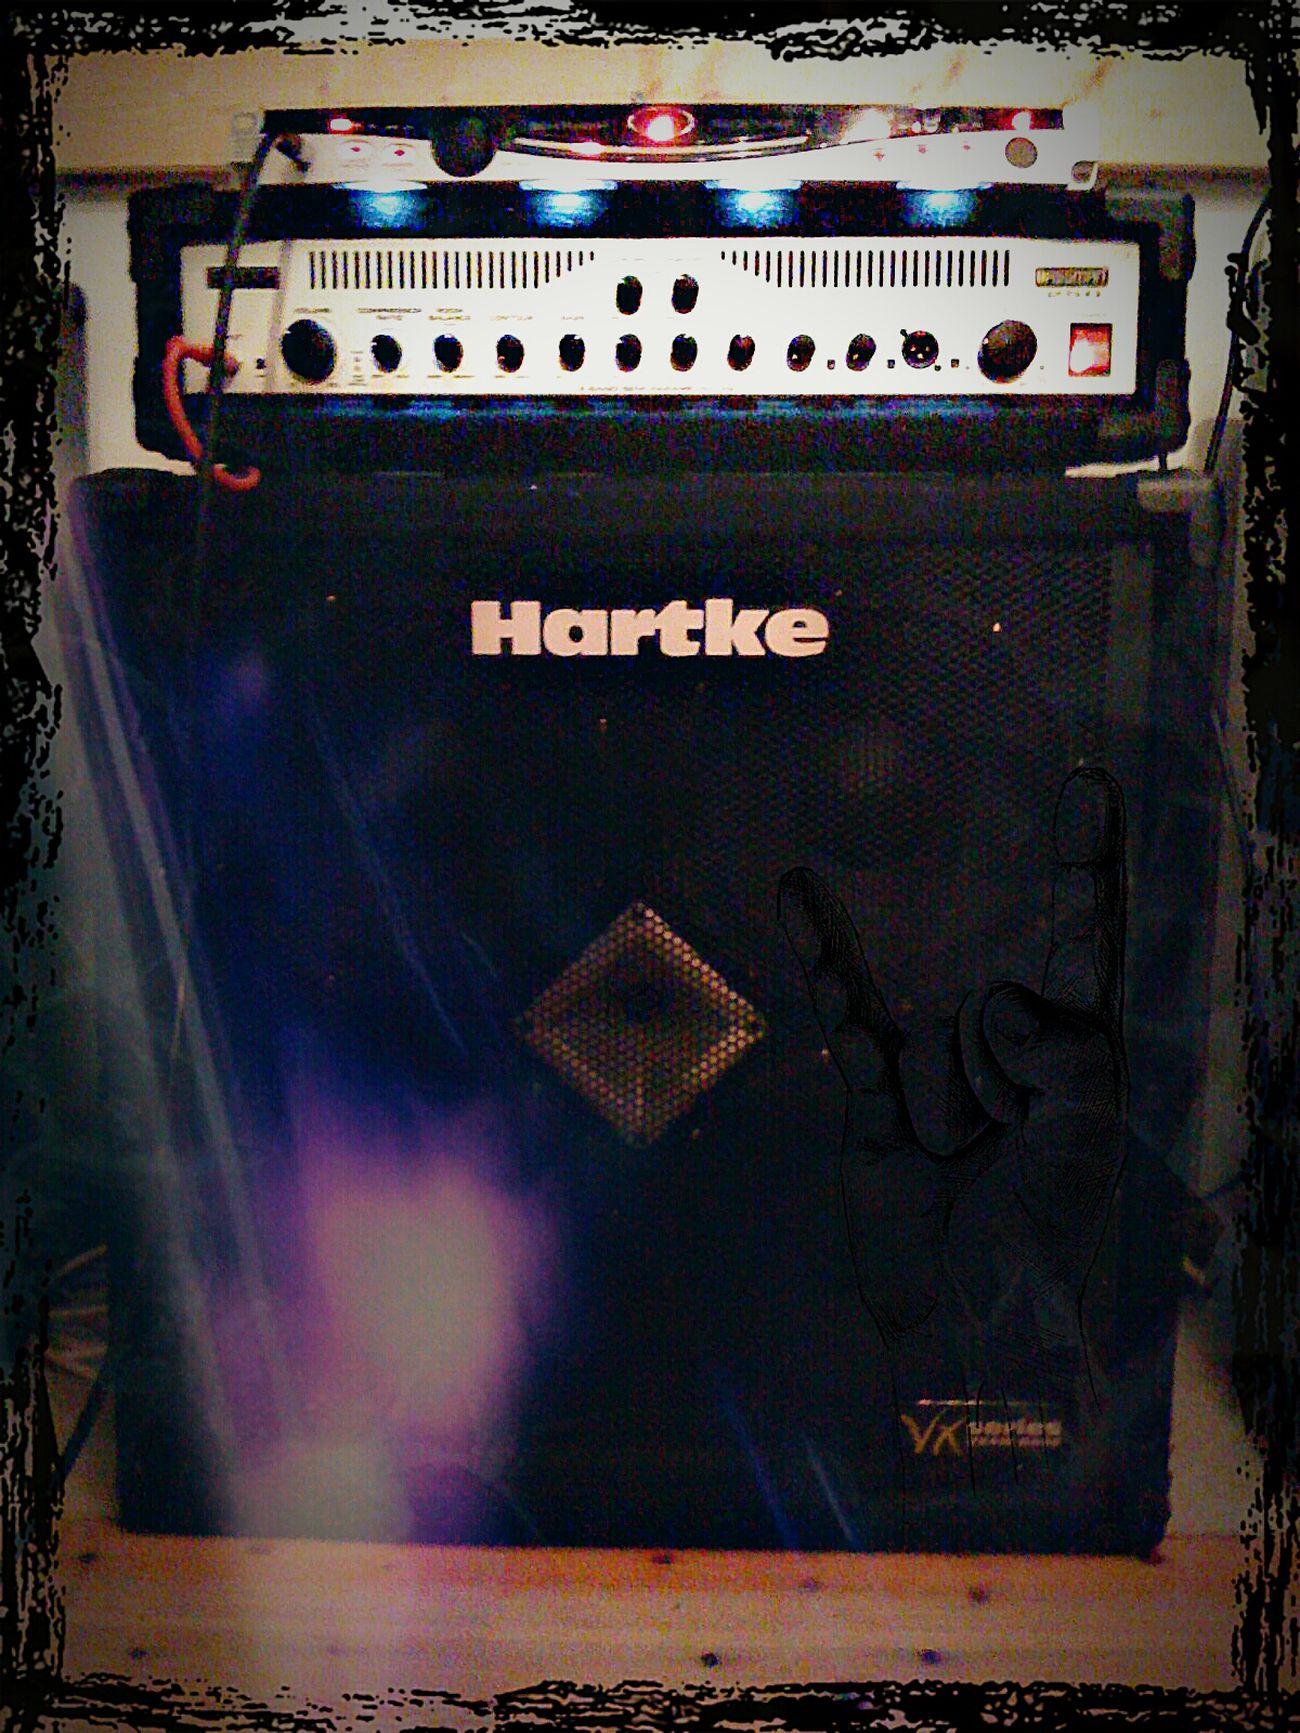 My New Toy. Bassist Amp Hartke Fender Amp ROCK ON! Live Music Flensburg ;)